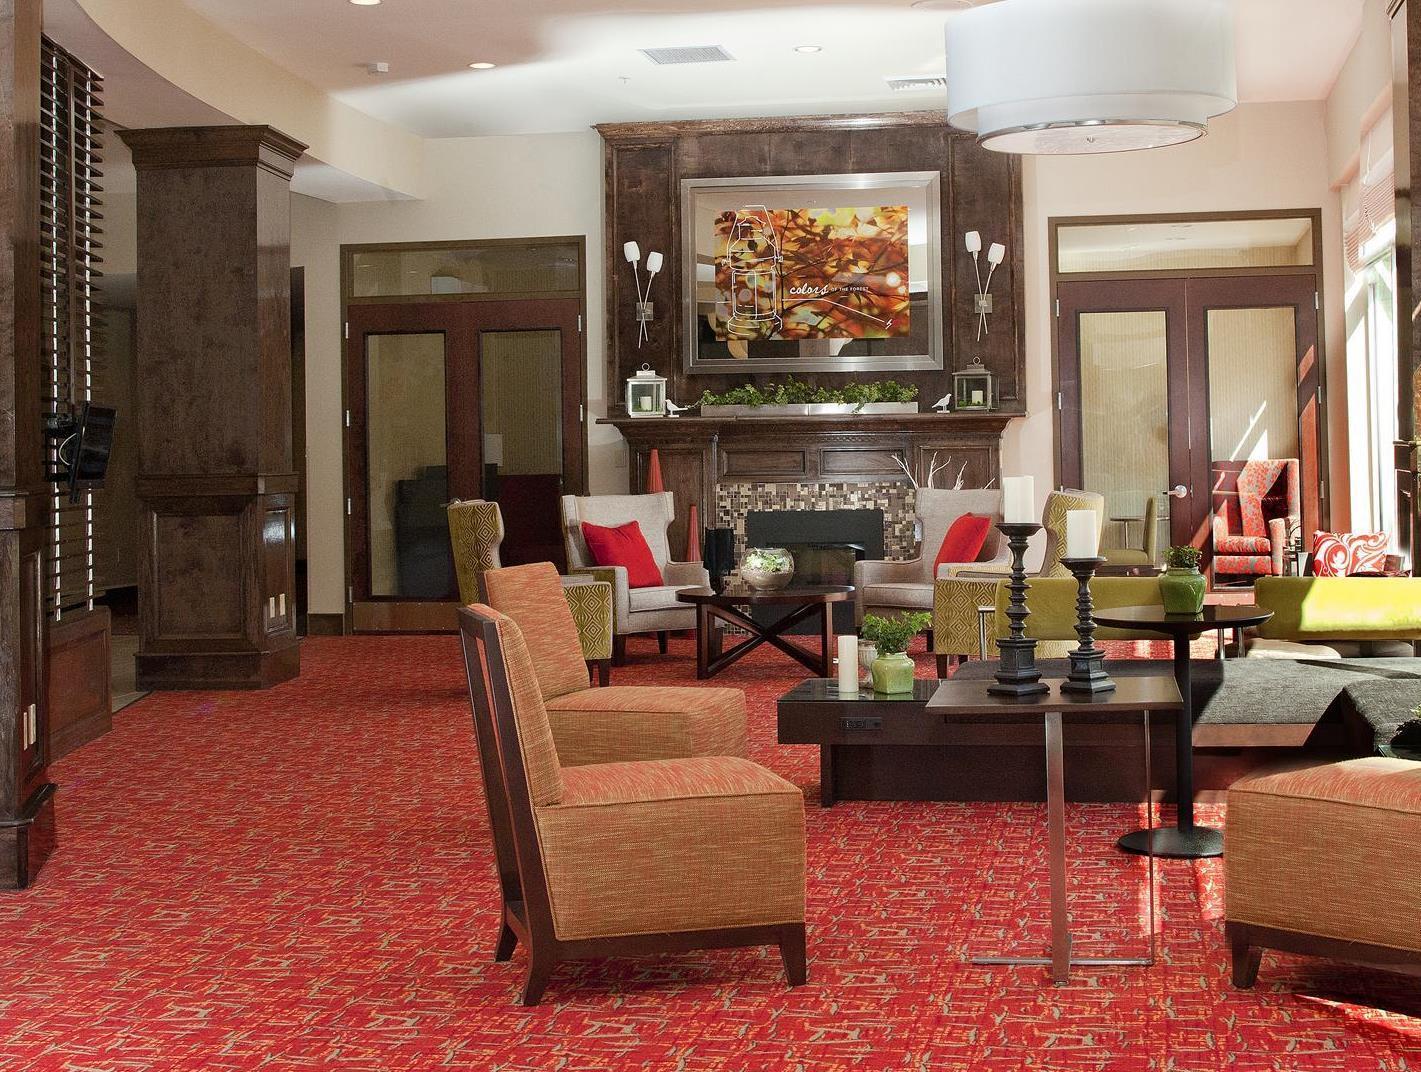 Hilton garden inn preston